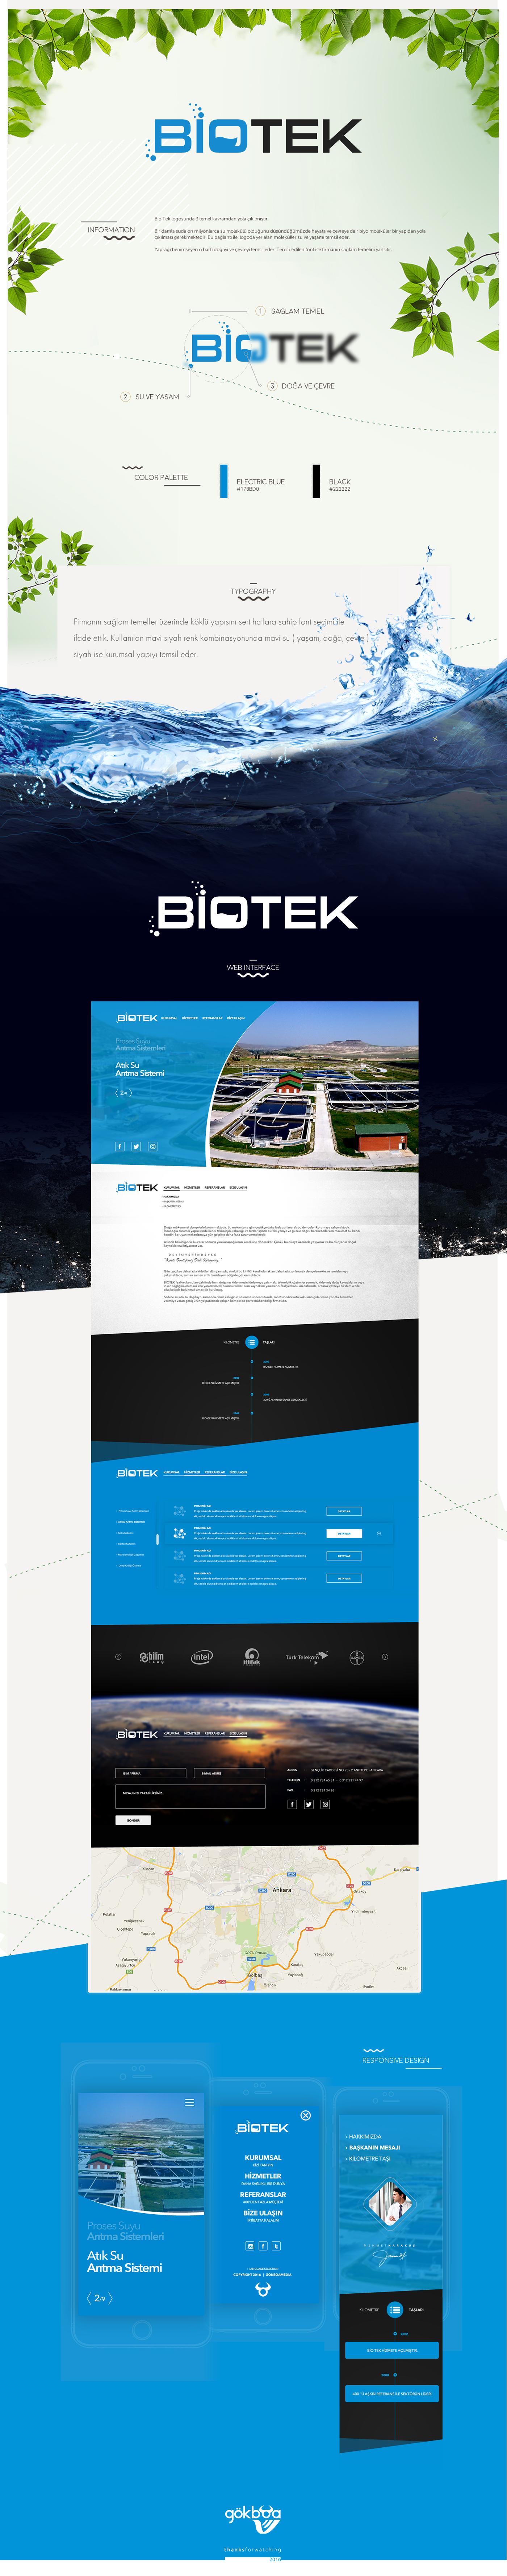 gokboa,Web Design ,Responsive,Logo Design,Nature,water,brand,Advertising ,ui ux